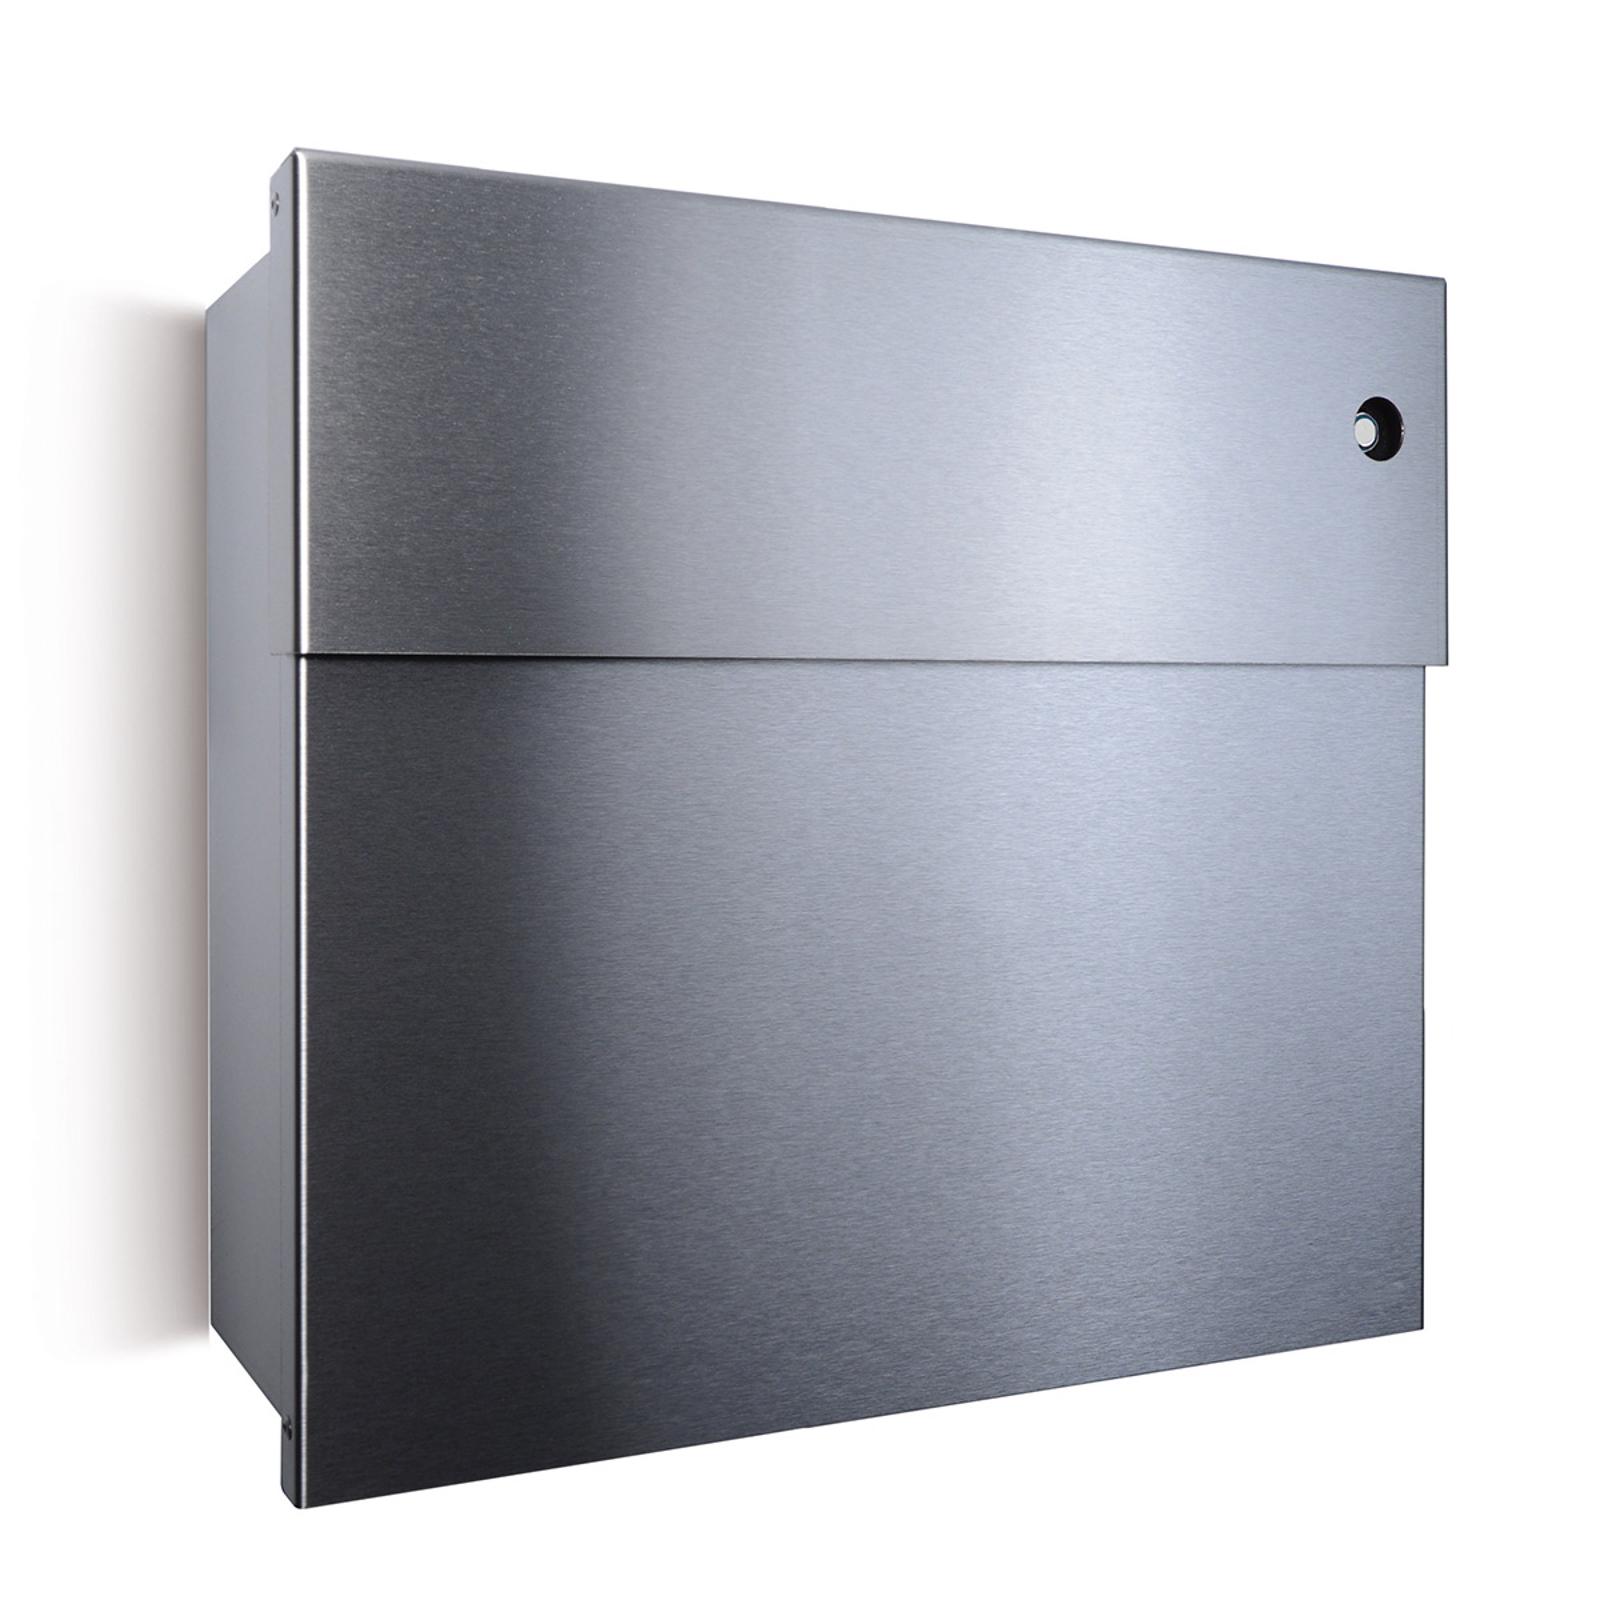 Letterman IV letterbox, blue bell, stainless steel_1057148_1